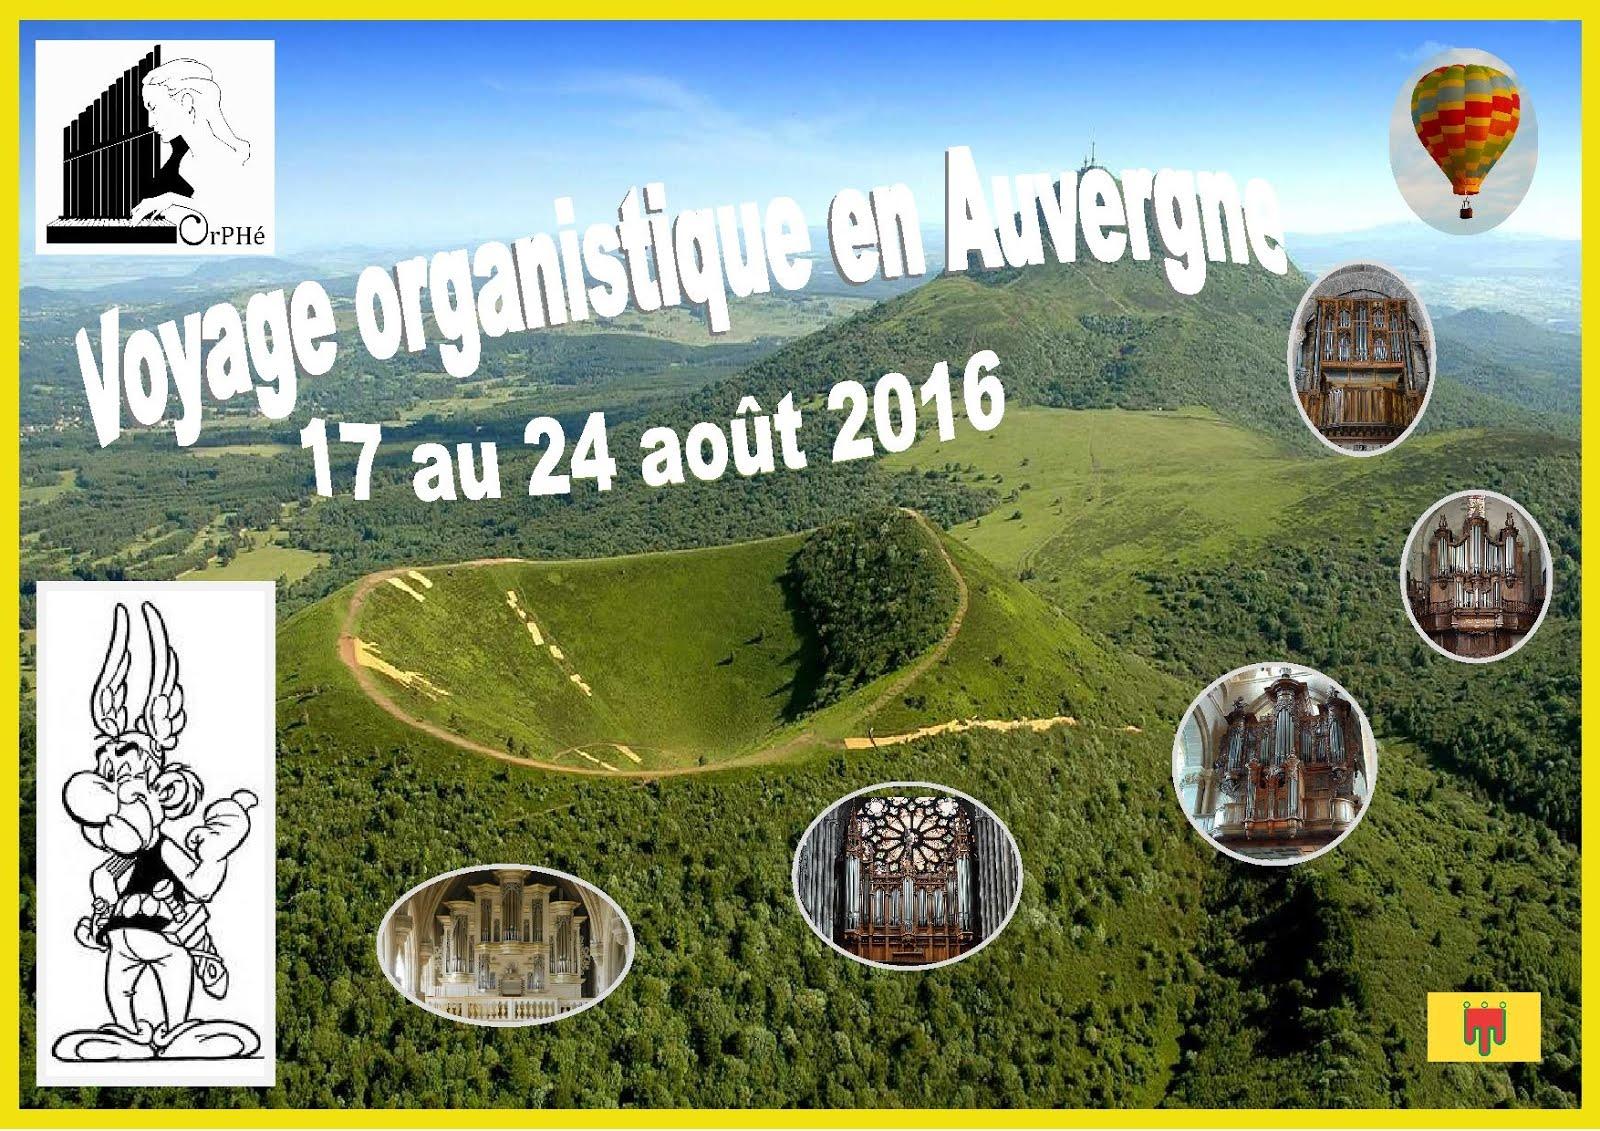 Voyage organistique en Auvergne 2016